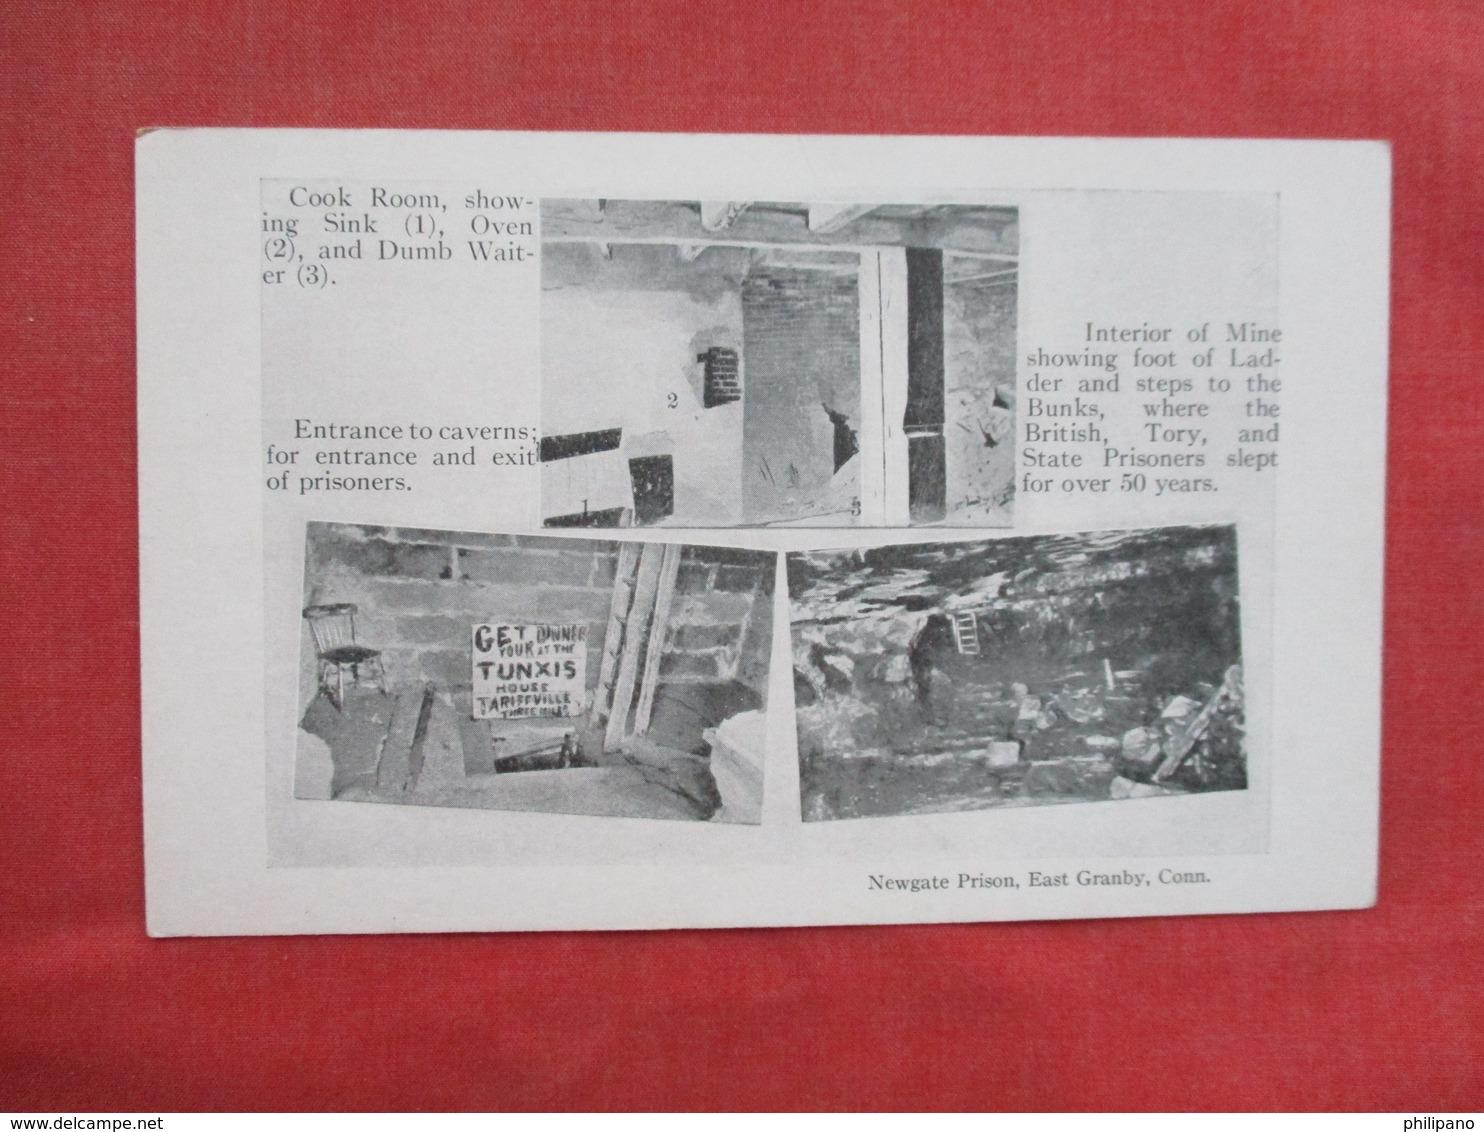 M/V ----Cook Room Entrance To Caverns  Interior Of Mine      Newgate Prison          East Granby Conn.      Ref 3430 - Prison